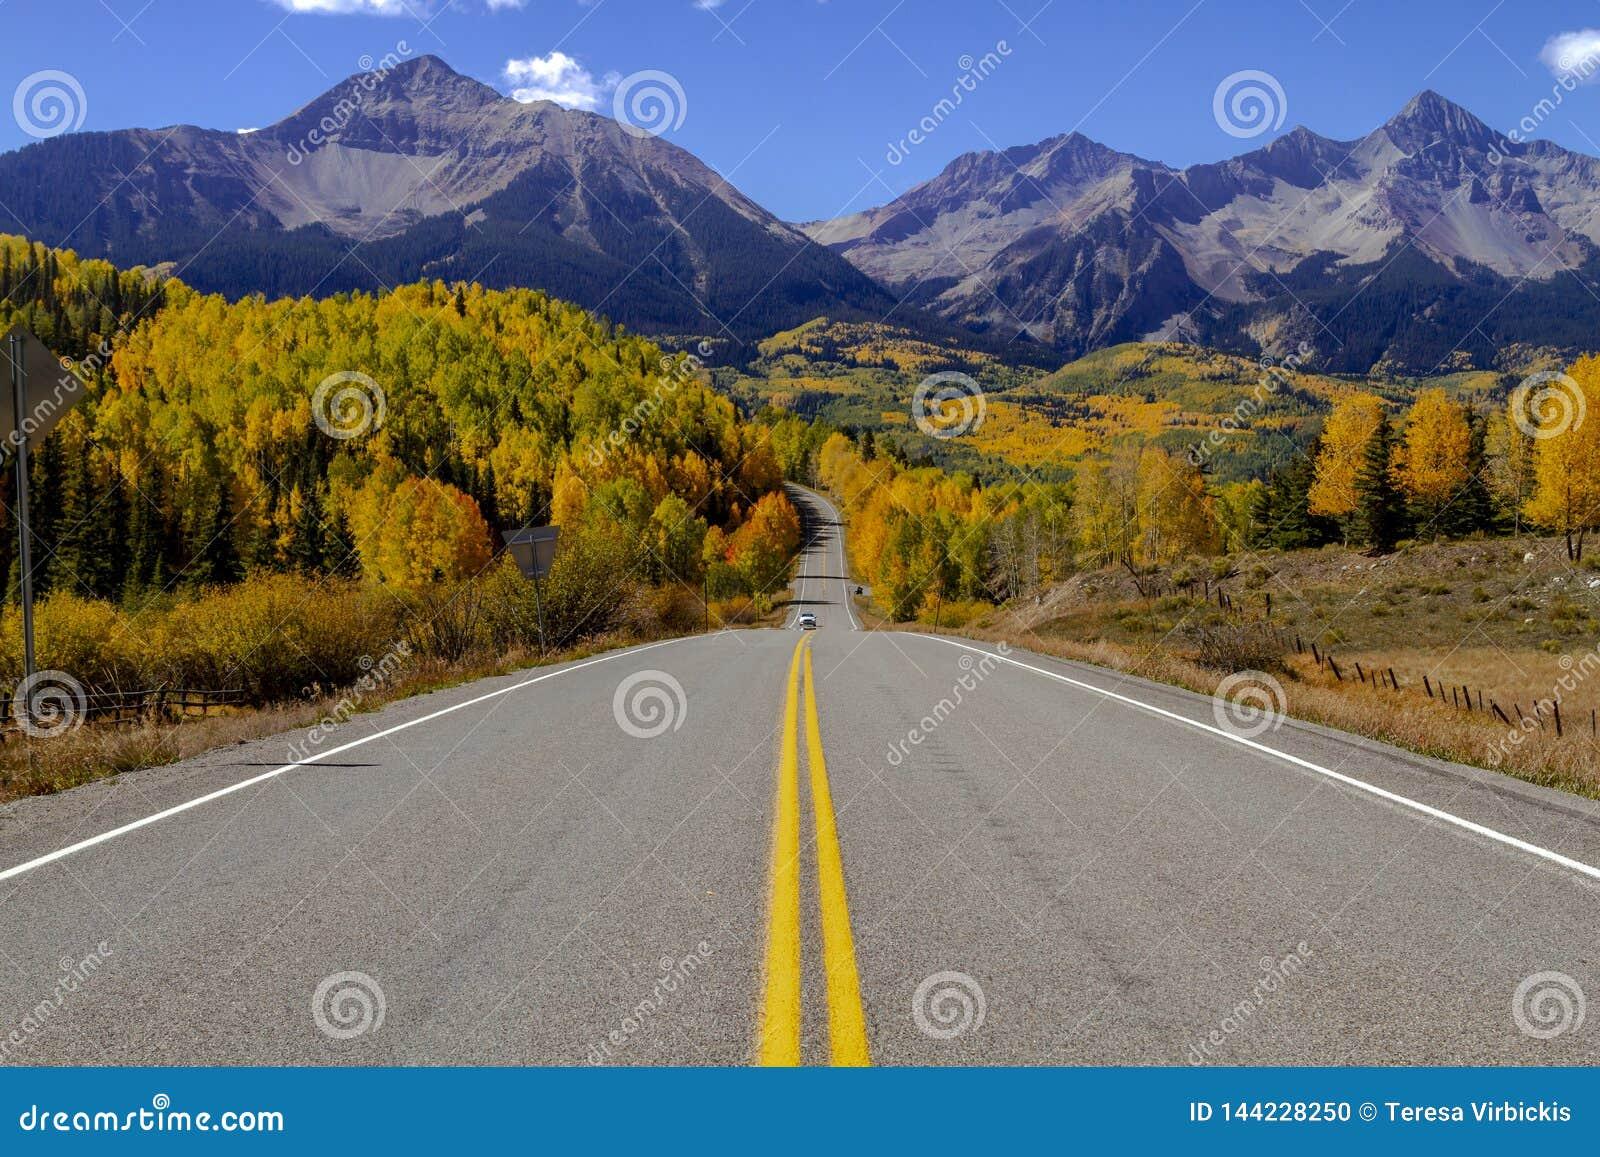 Autumn Color in San Juan and Rocky Mountains of Colorado